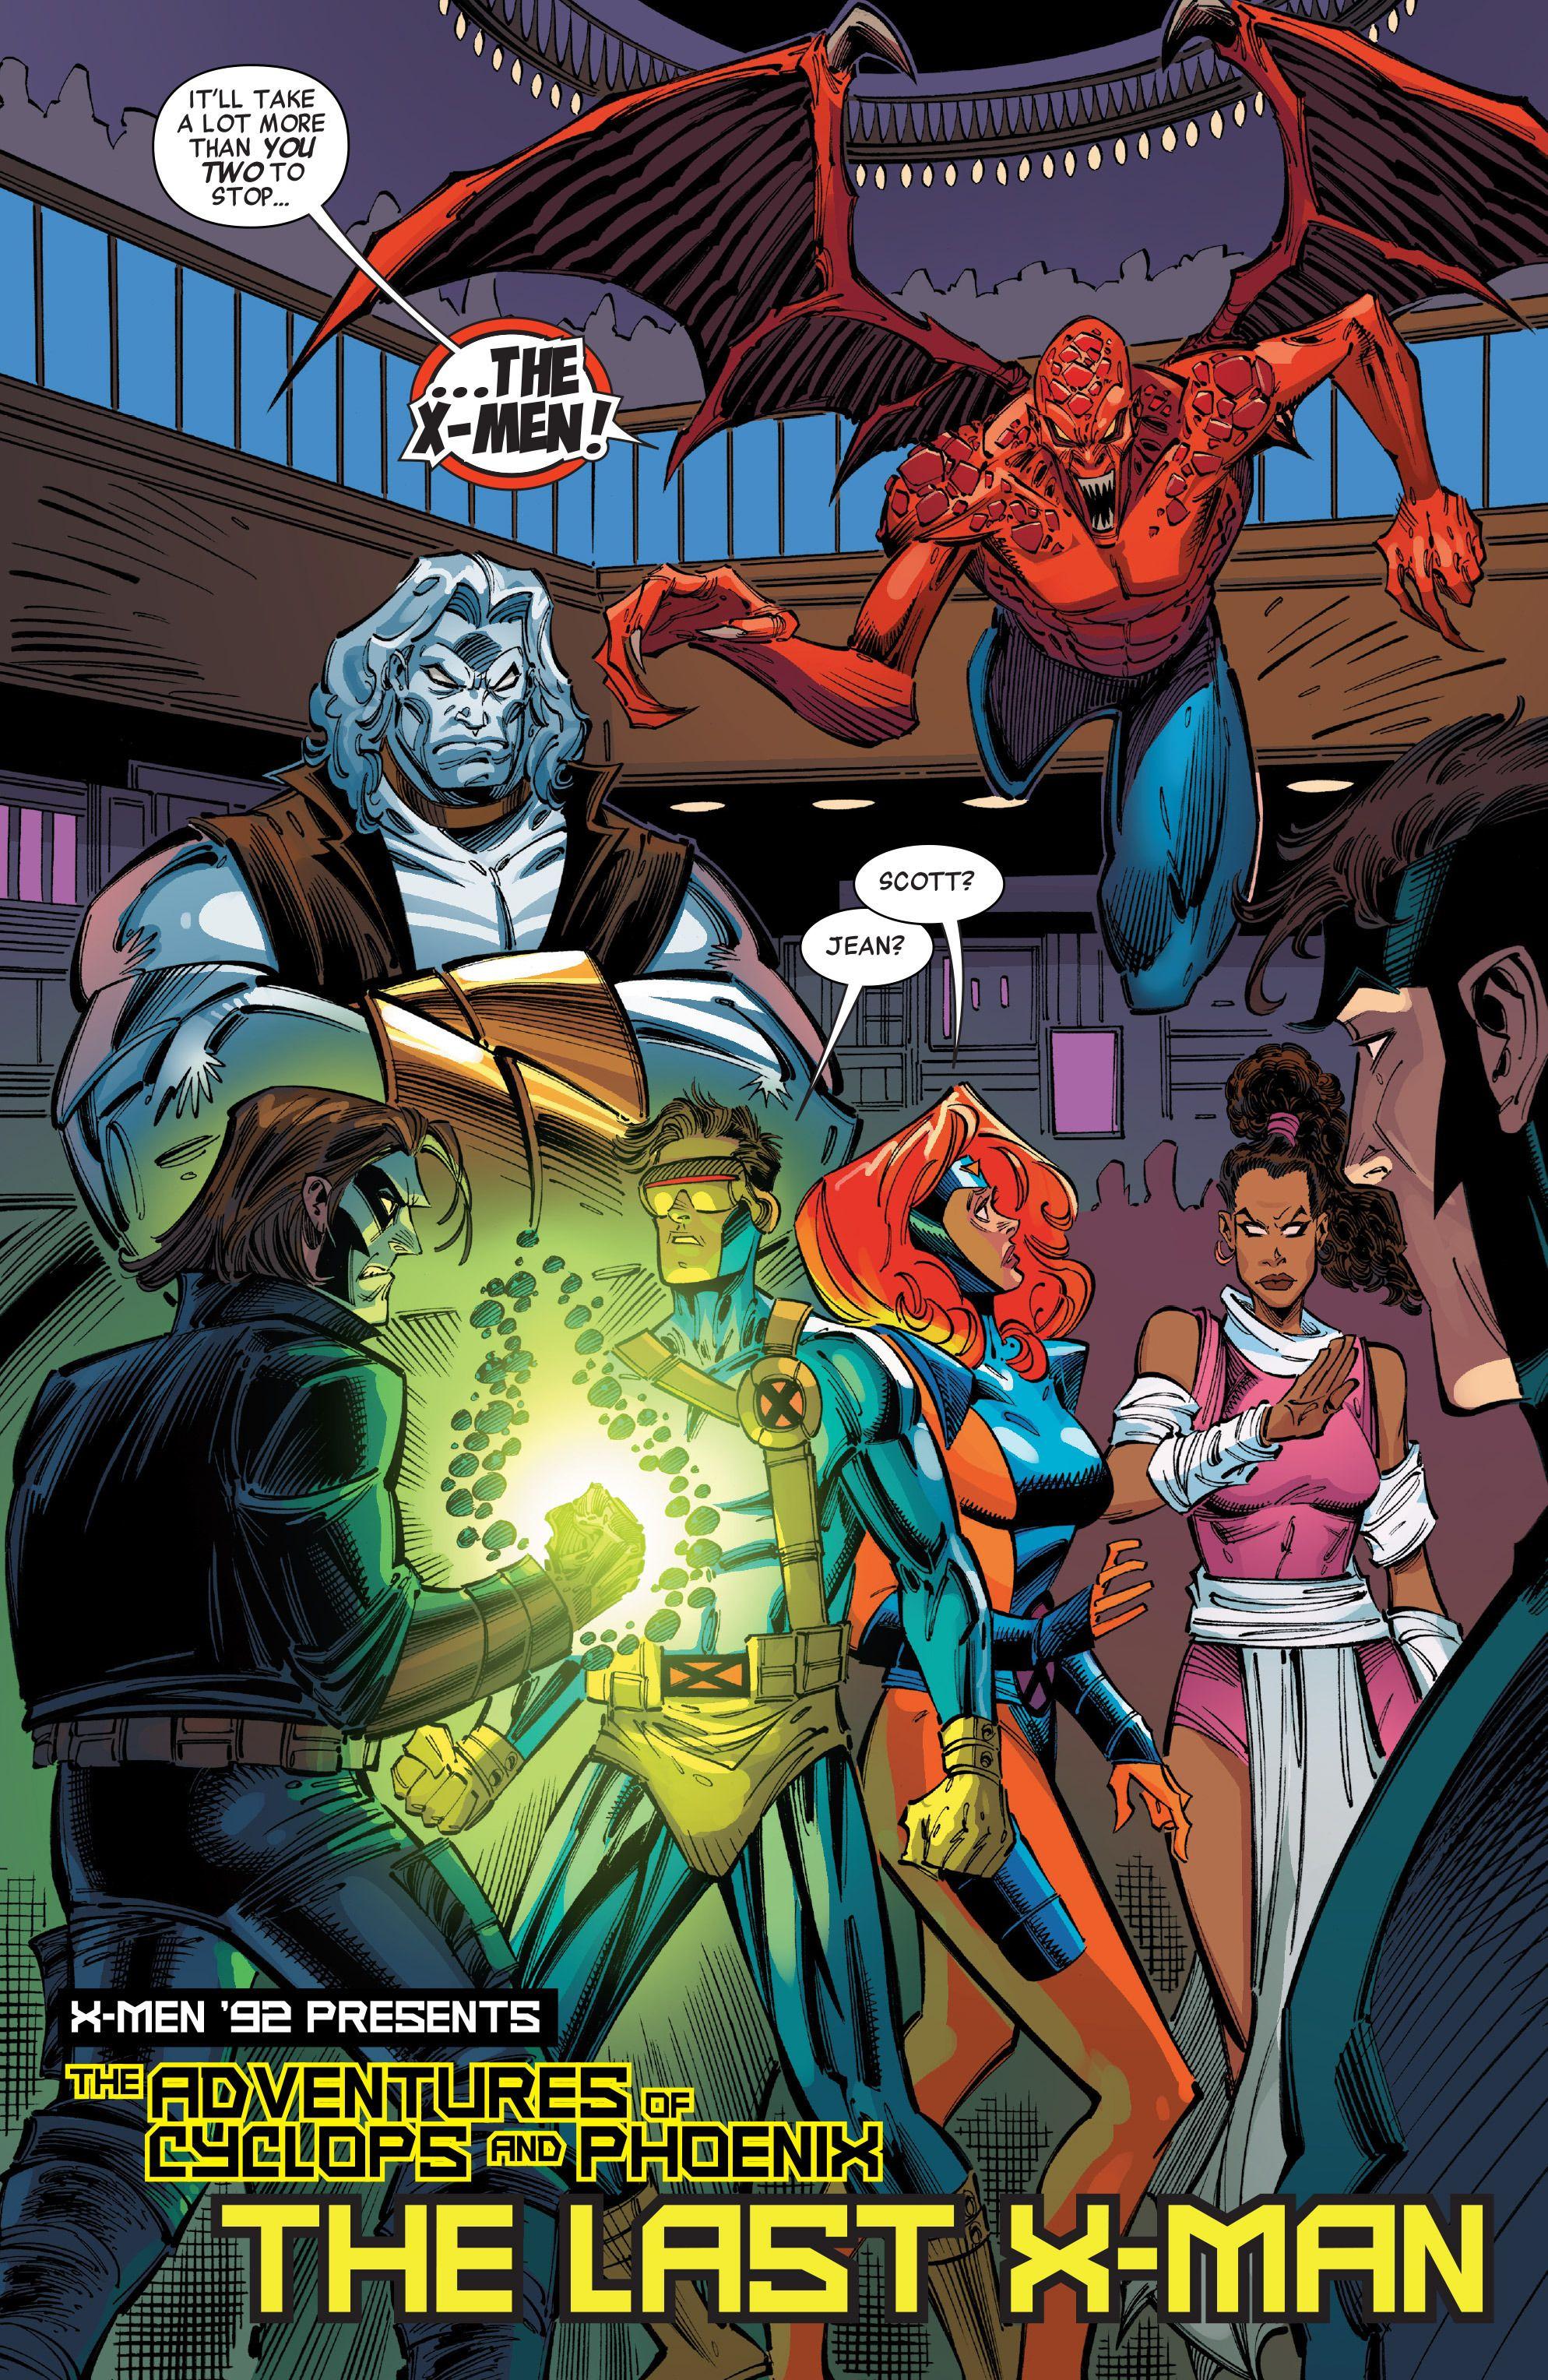 X Men 92 2016 Issue 5 Read X Men 92 2016 Issue 5 Comic Online In High Quality X Men Comics Villain Character